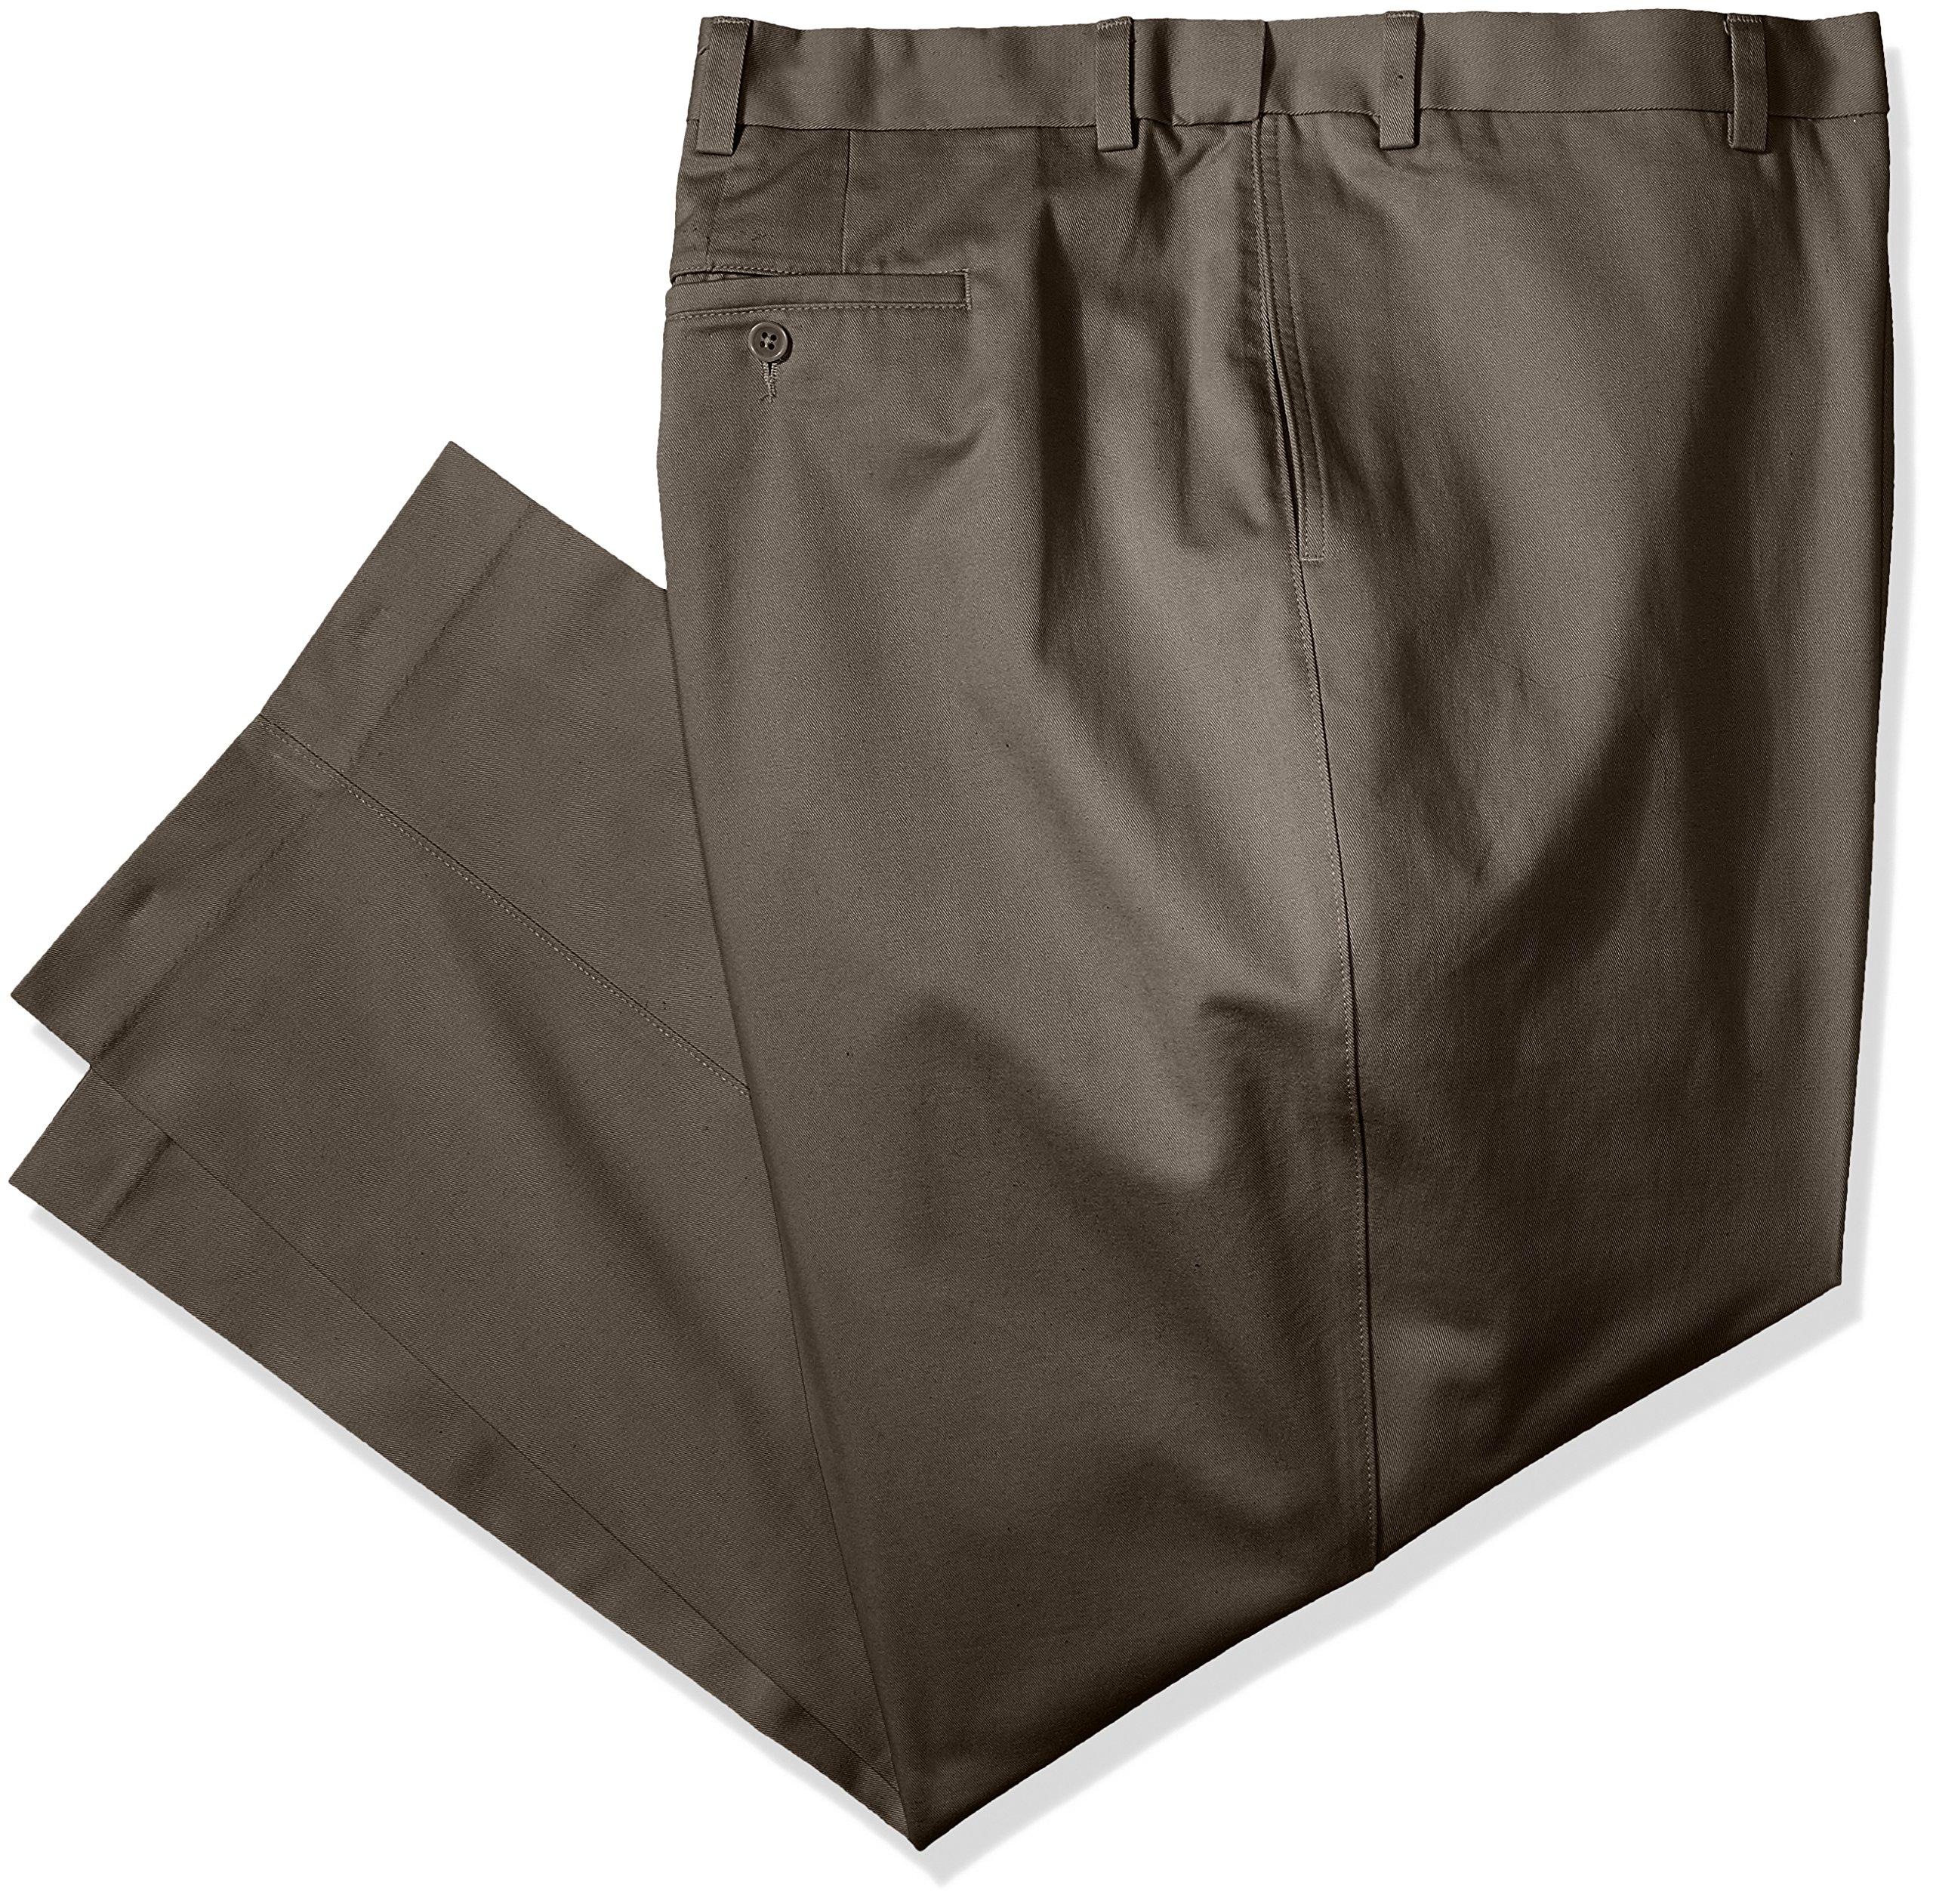 Savane Men's Big and Tall Flat Front Performance Chino Pant, Shale, 36W x 38L